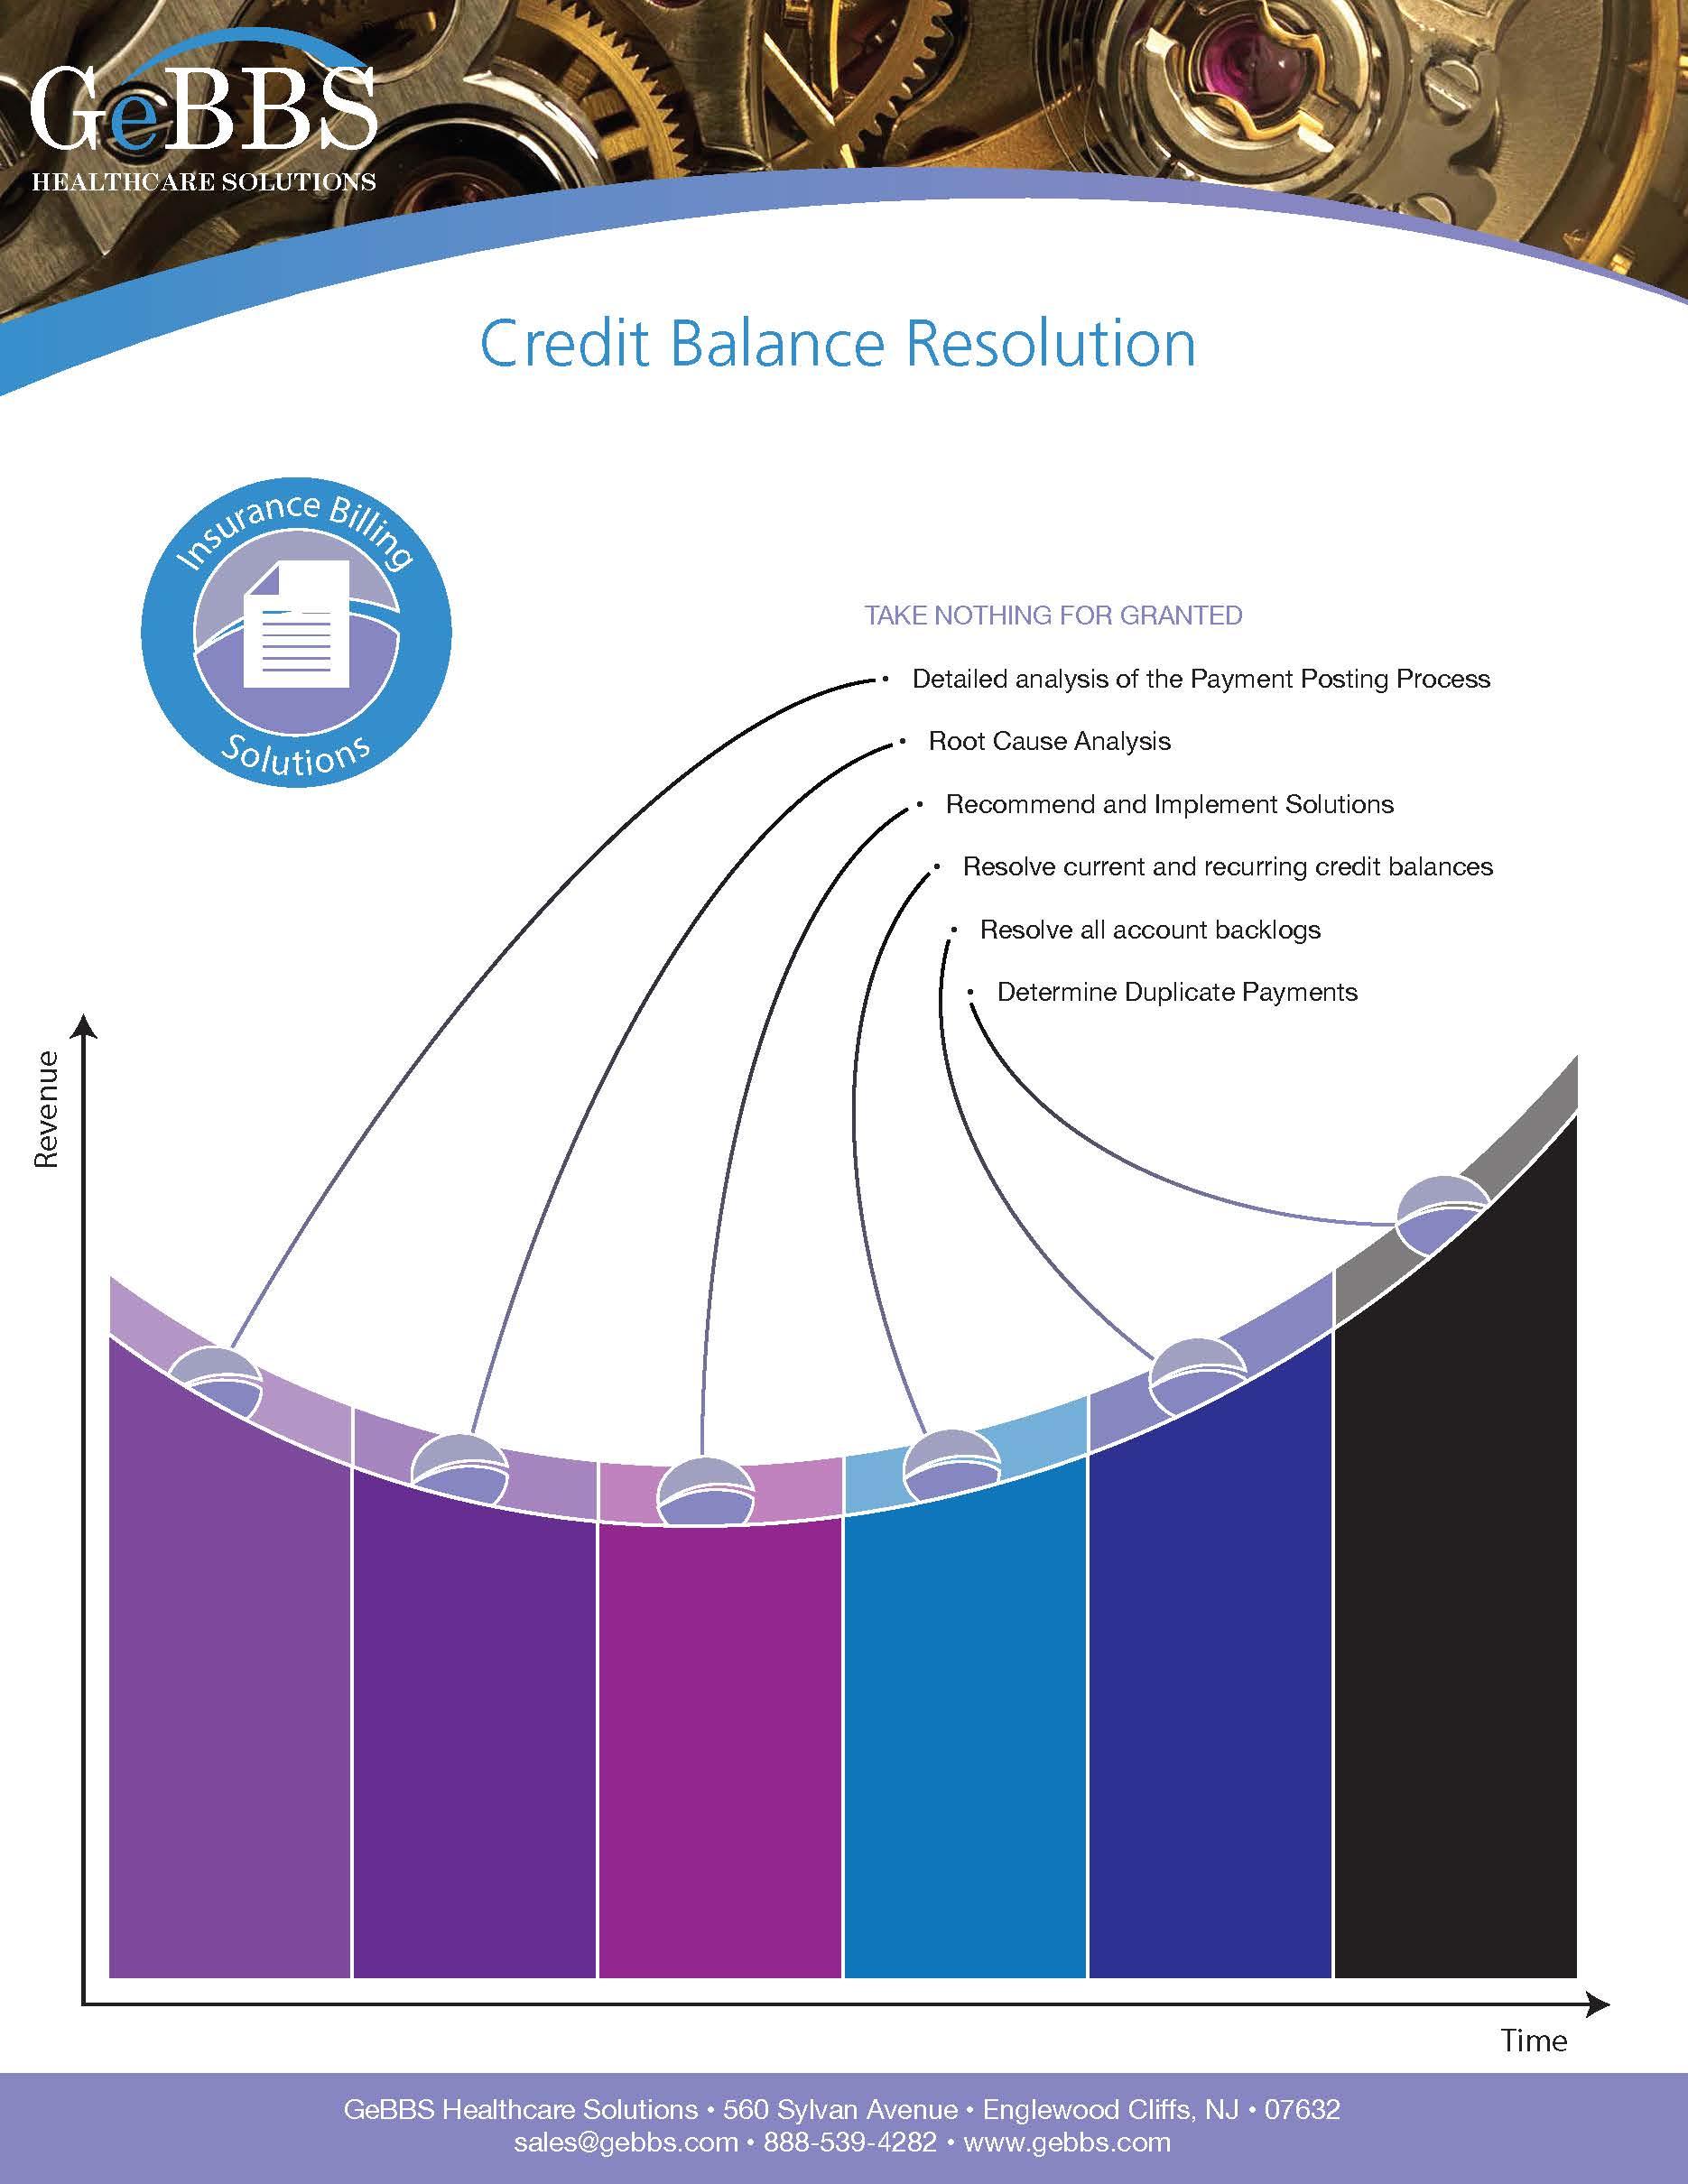 GeBBS Credit Balance Resolution Sell Sheet v2_Page_2.jpg